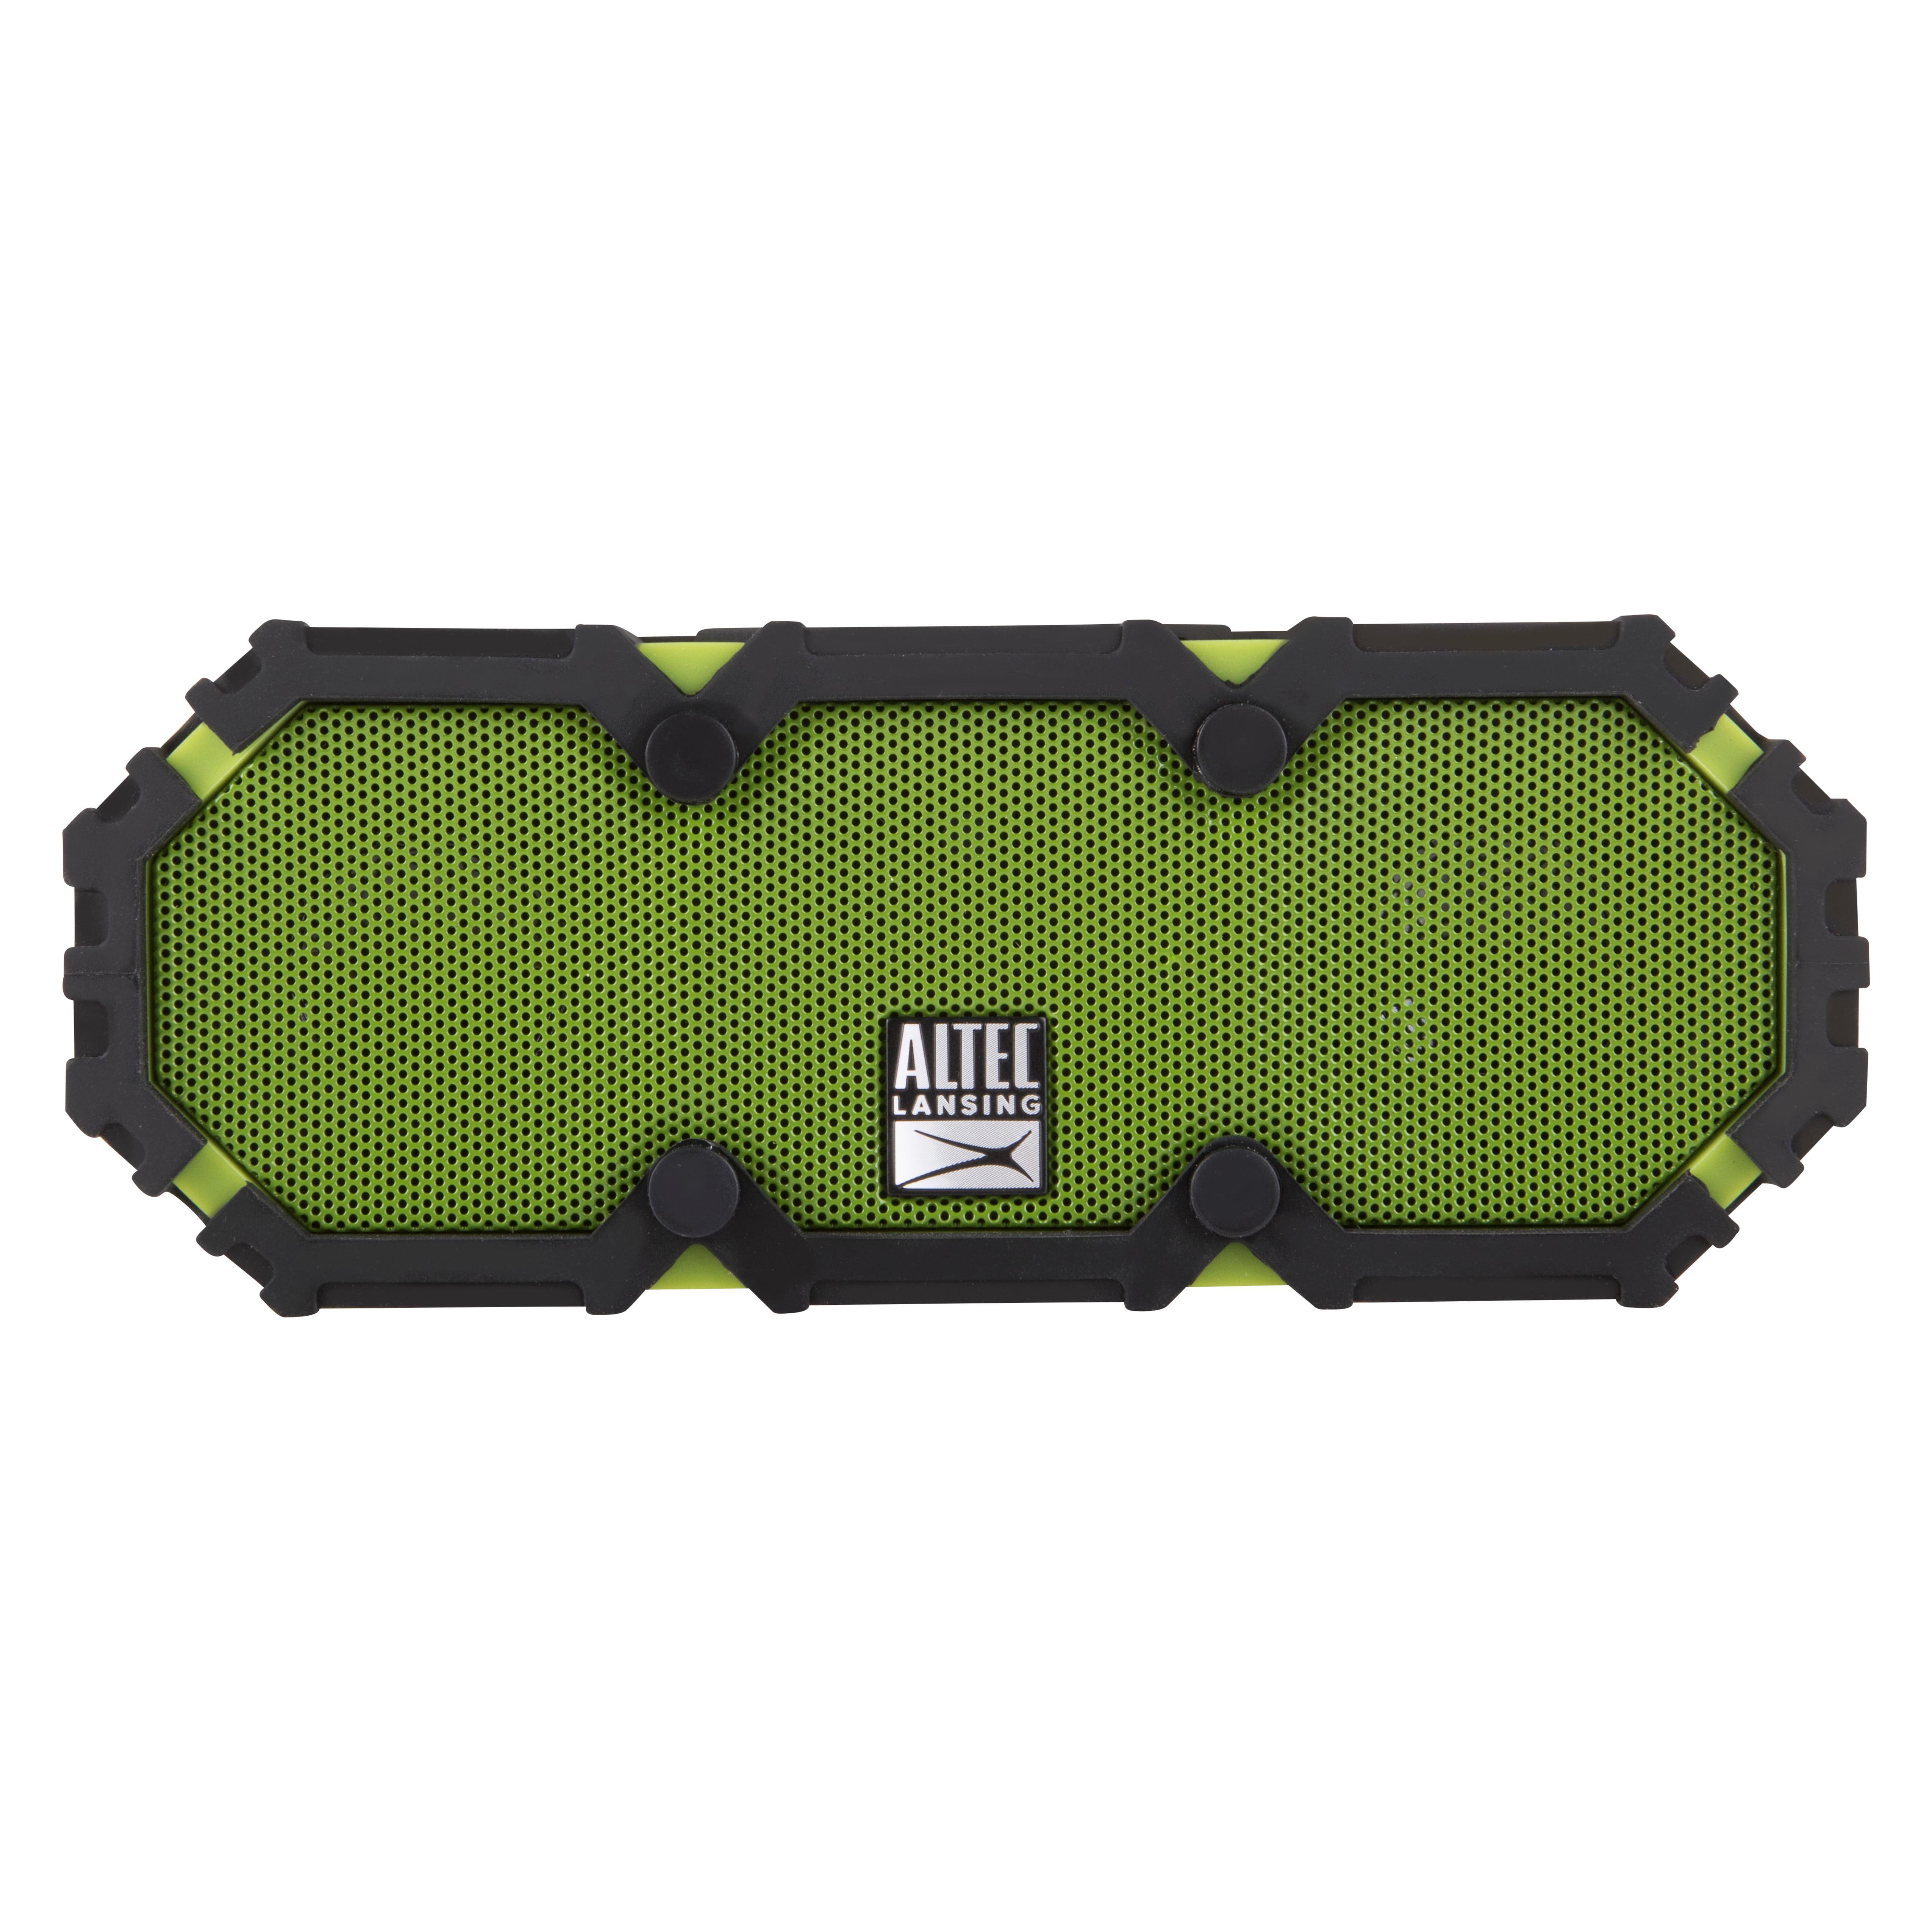 Altec lansing life jacket best buy